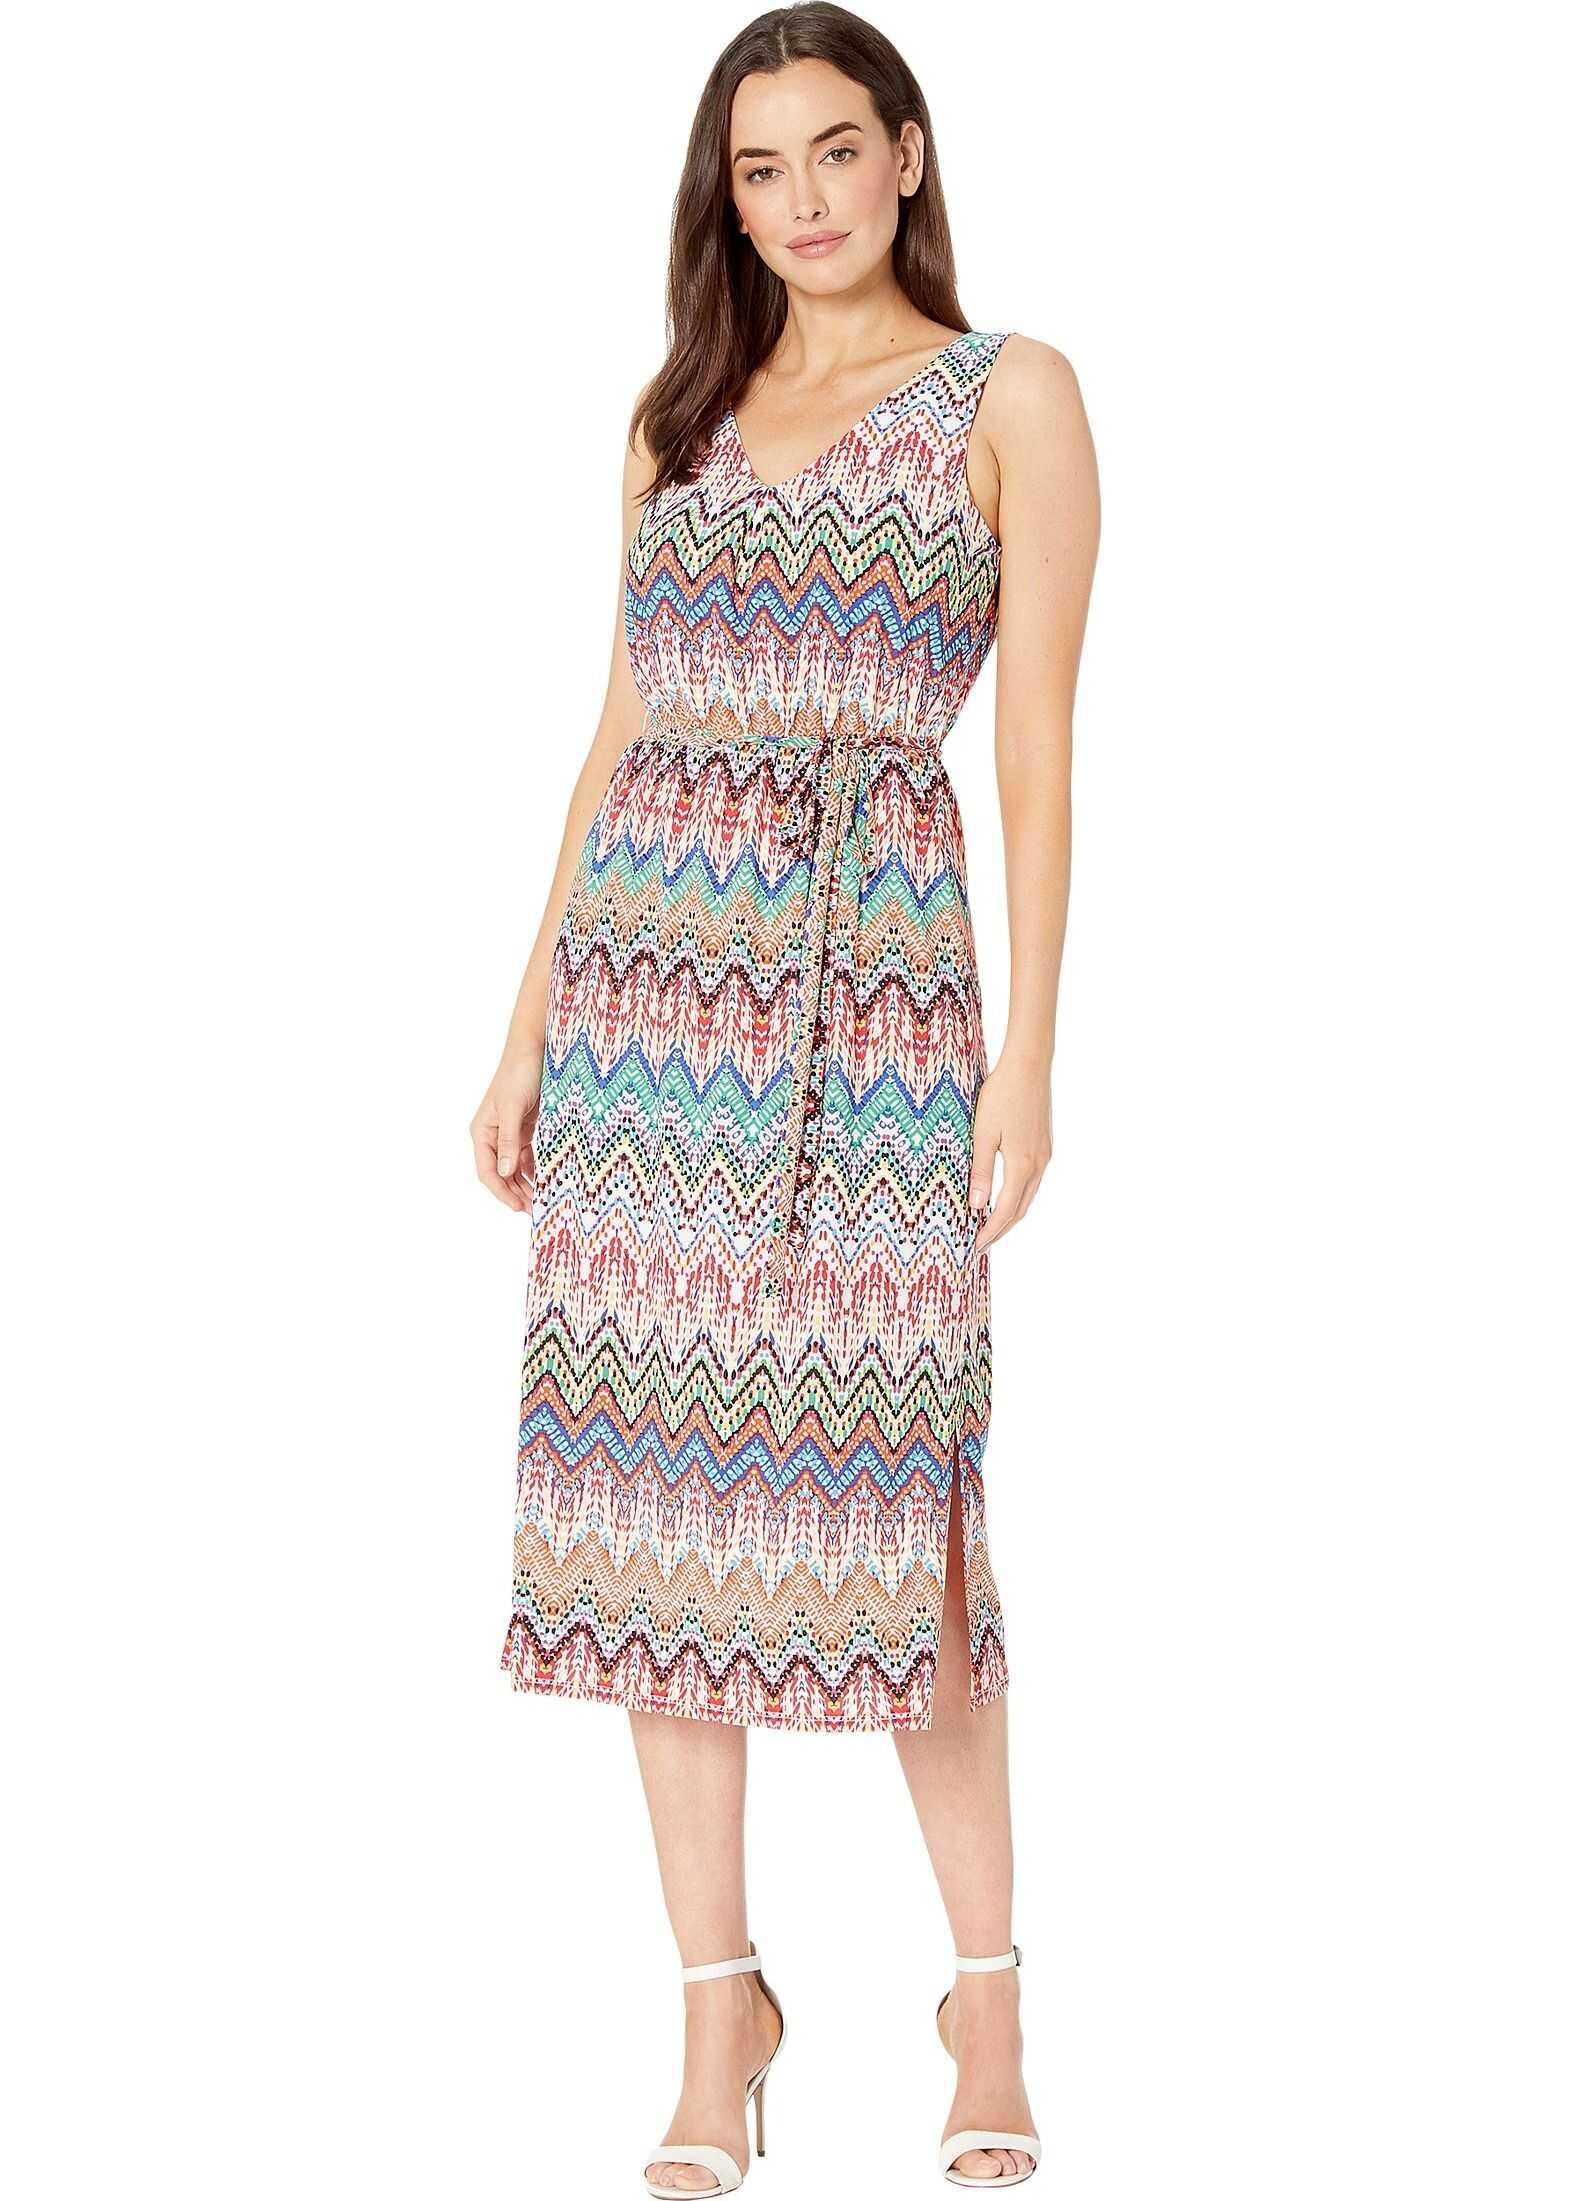 Nine West Ity Chevron Sleeveless Midi Dress w/ Self Sash Mango Multi